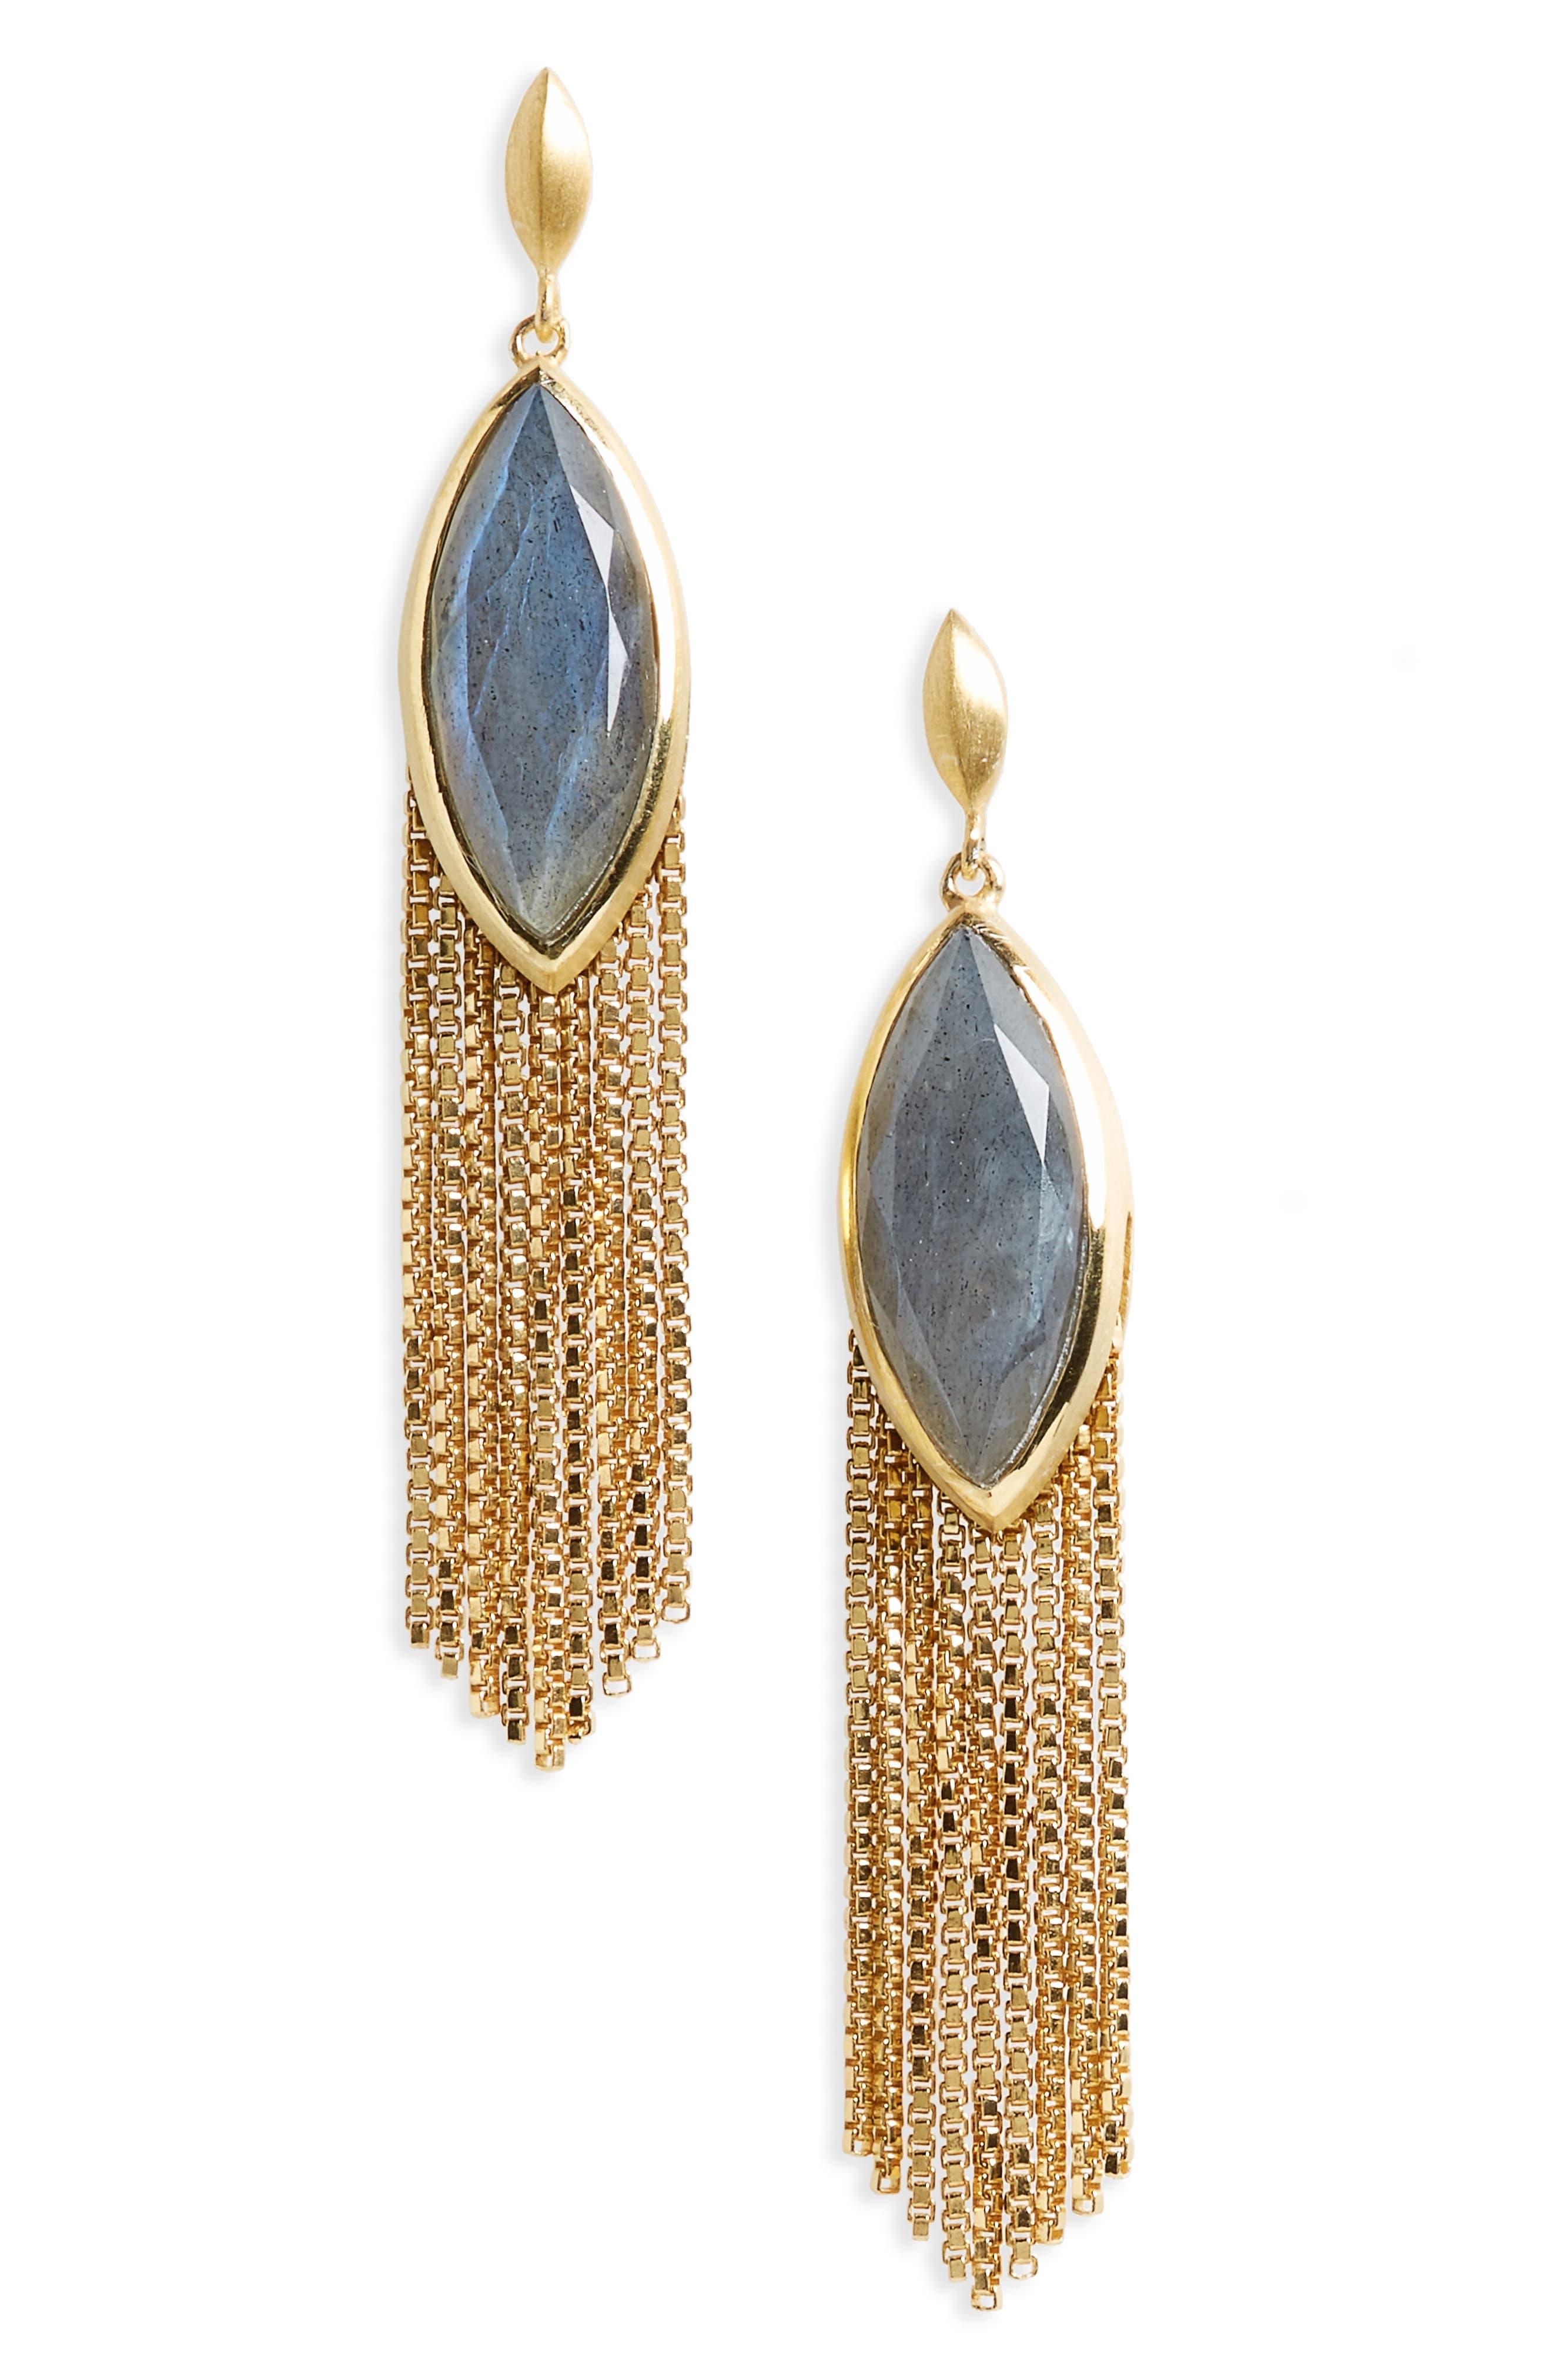 Ornate Semiprecious Stone Fringe Earrings,                             Main thumbnail 1, color,                             020